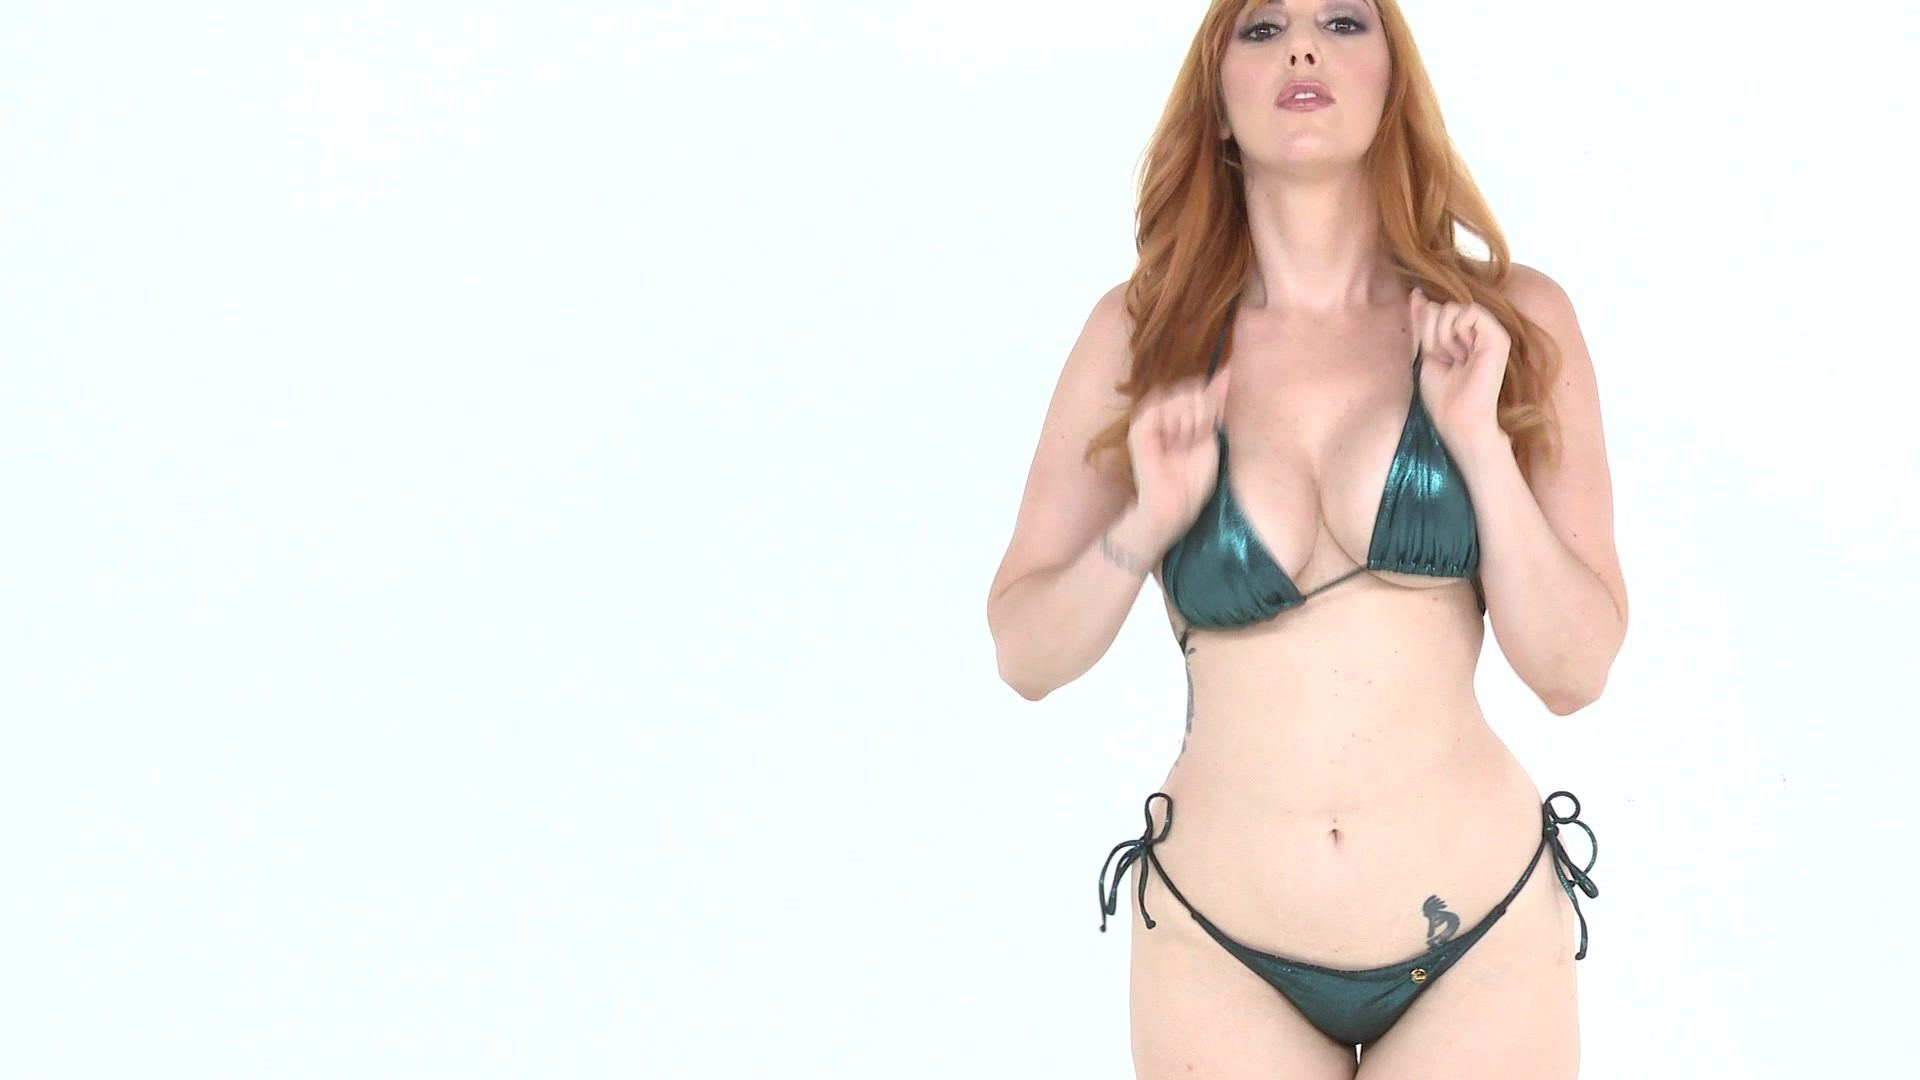 big wet interracial asses 2: lauren phillips streaming video at